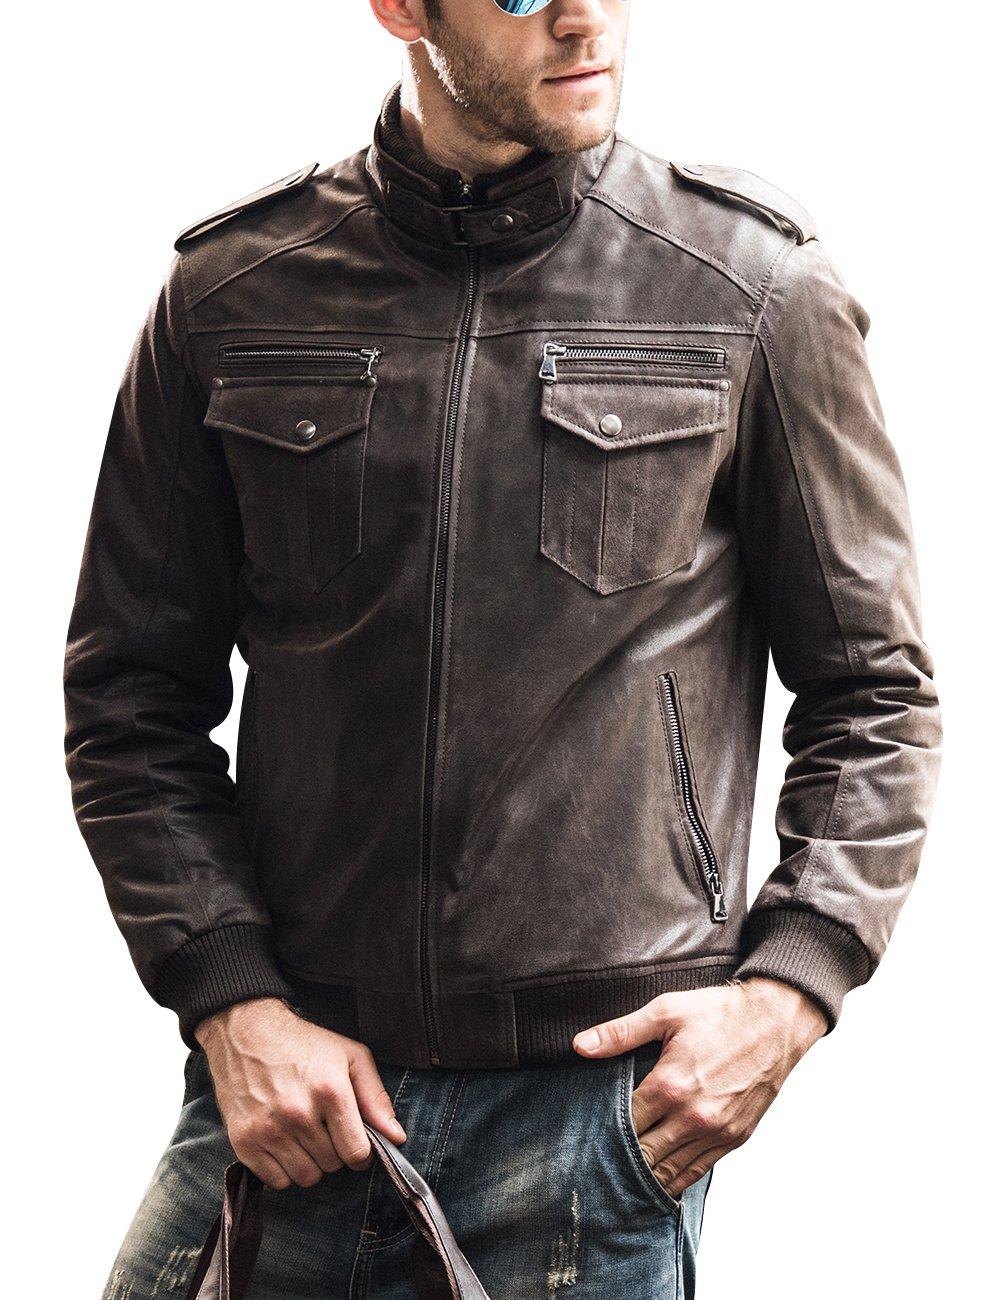 FLAVOR Men Biker retro Brown Leather Motorcycle Jacket Genuine Leather jacket (CN Small(US Medium), Dark Brown)